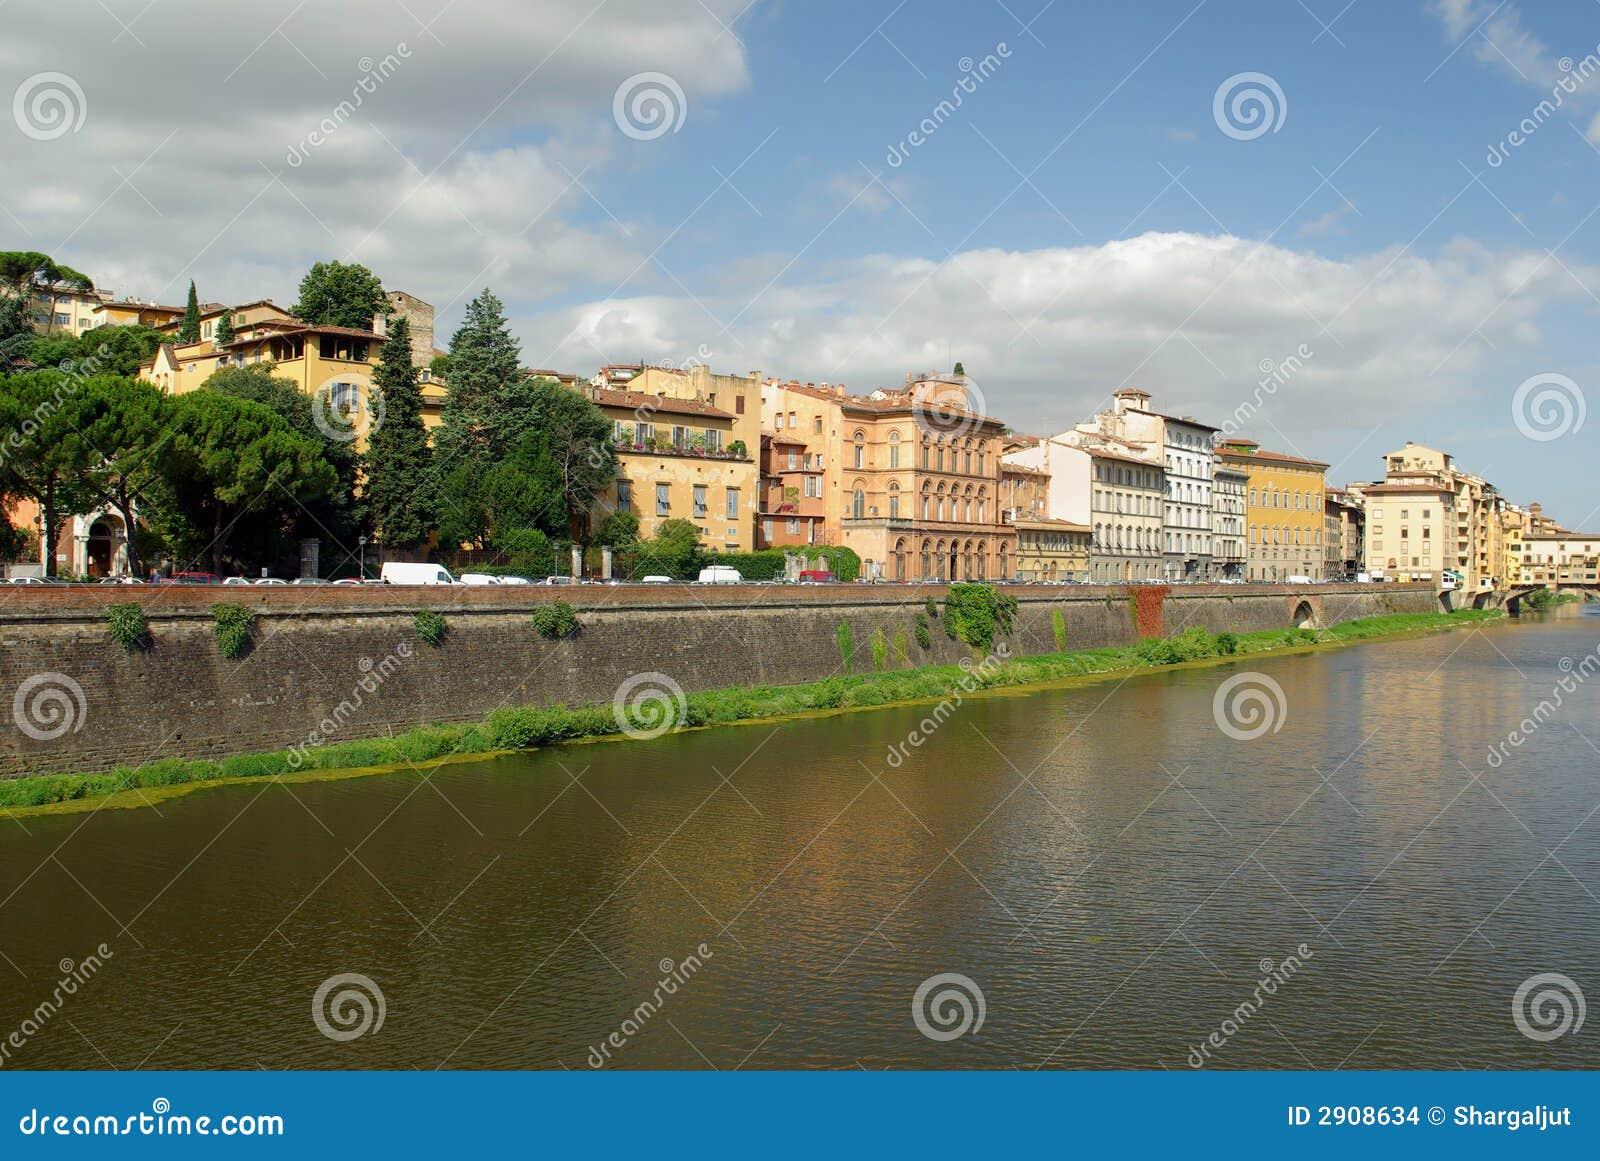 Arno-Fluss, Florenz, Italien